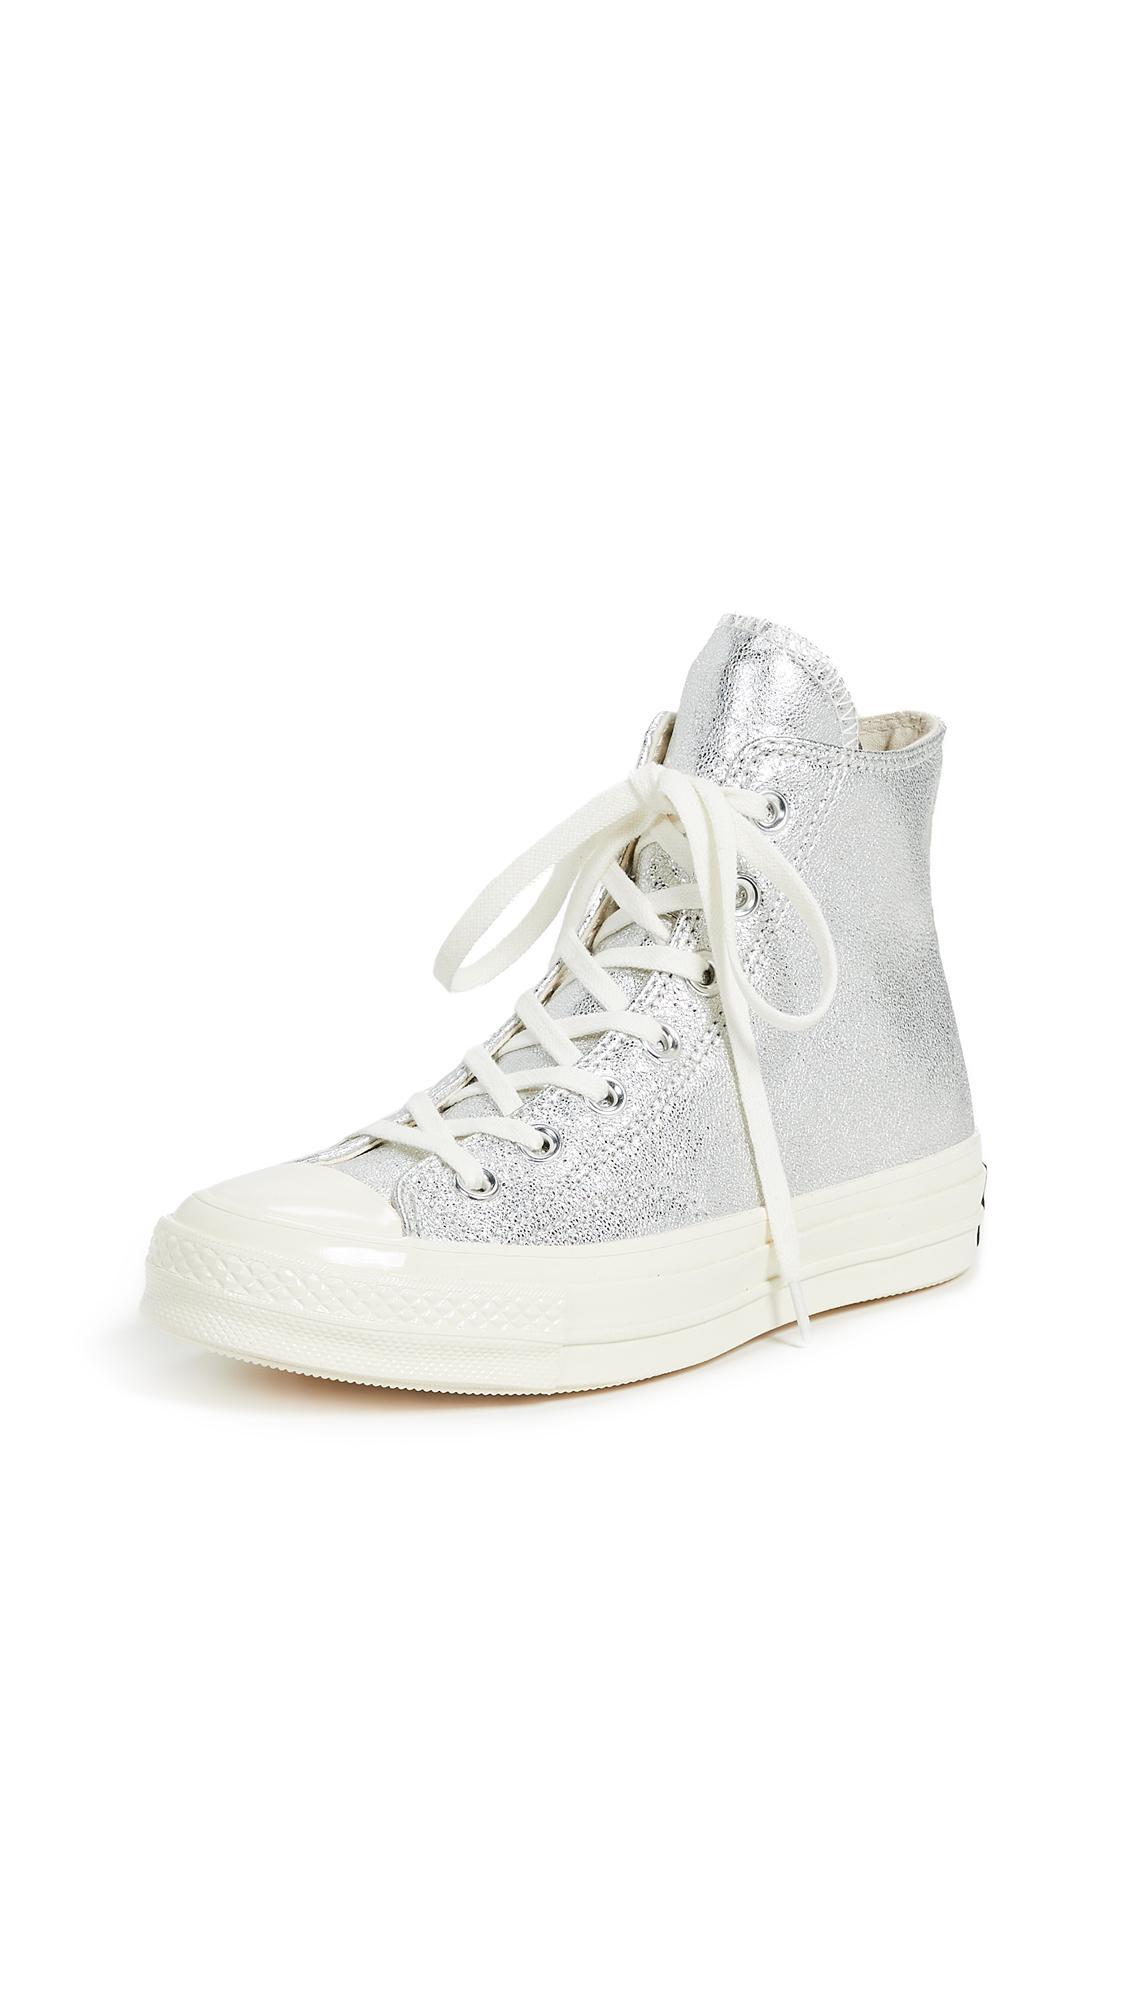 856a5cb2c97d Converse Women s Chuck Taylor All Star 70 Metallic High Top Sneakers In  Silver Egret